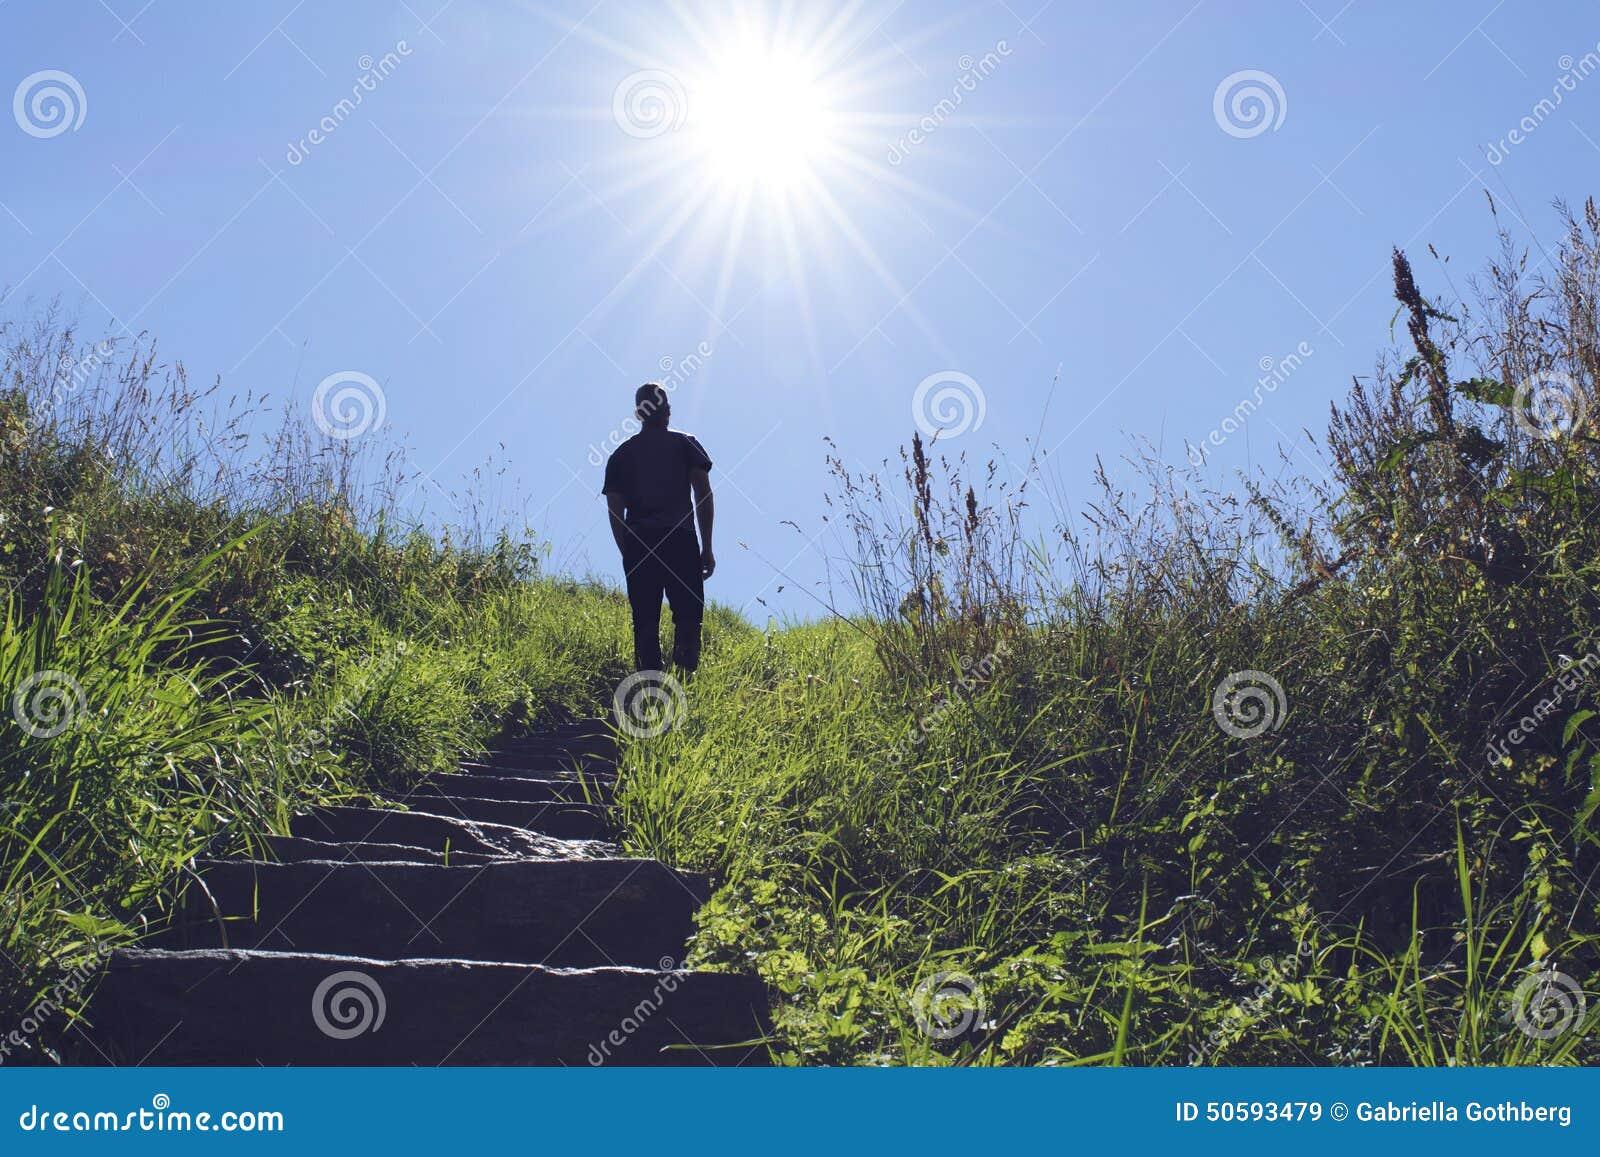 Silueta del hombre que camina encima de una escalera hacia el sol